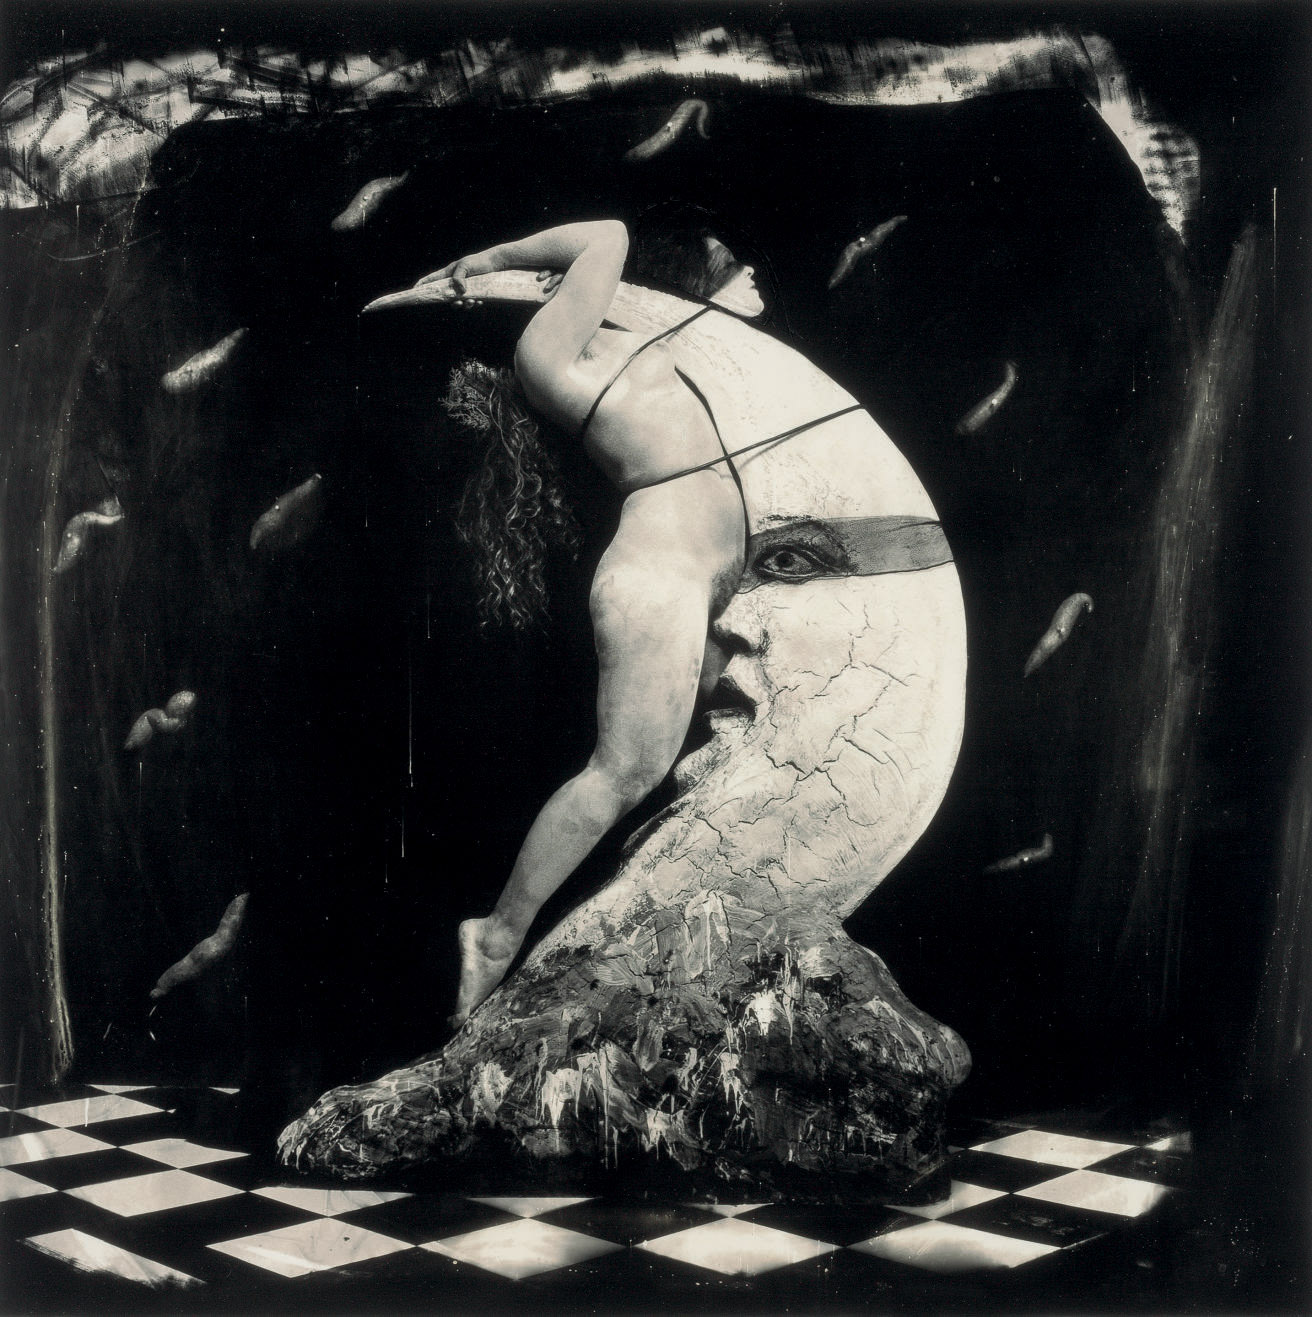 Woman Masturbating on the Moon, 1982